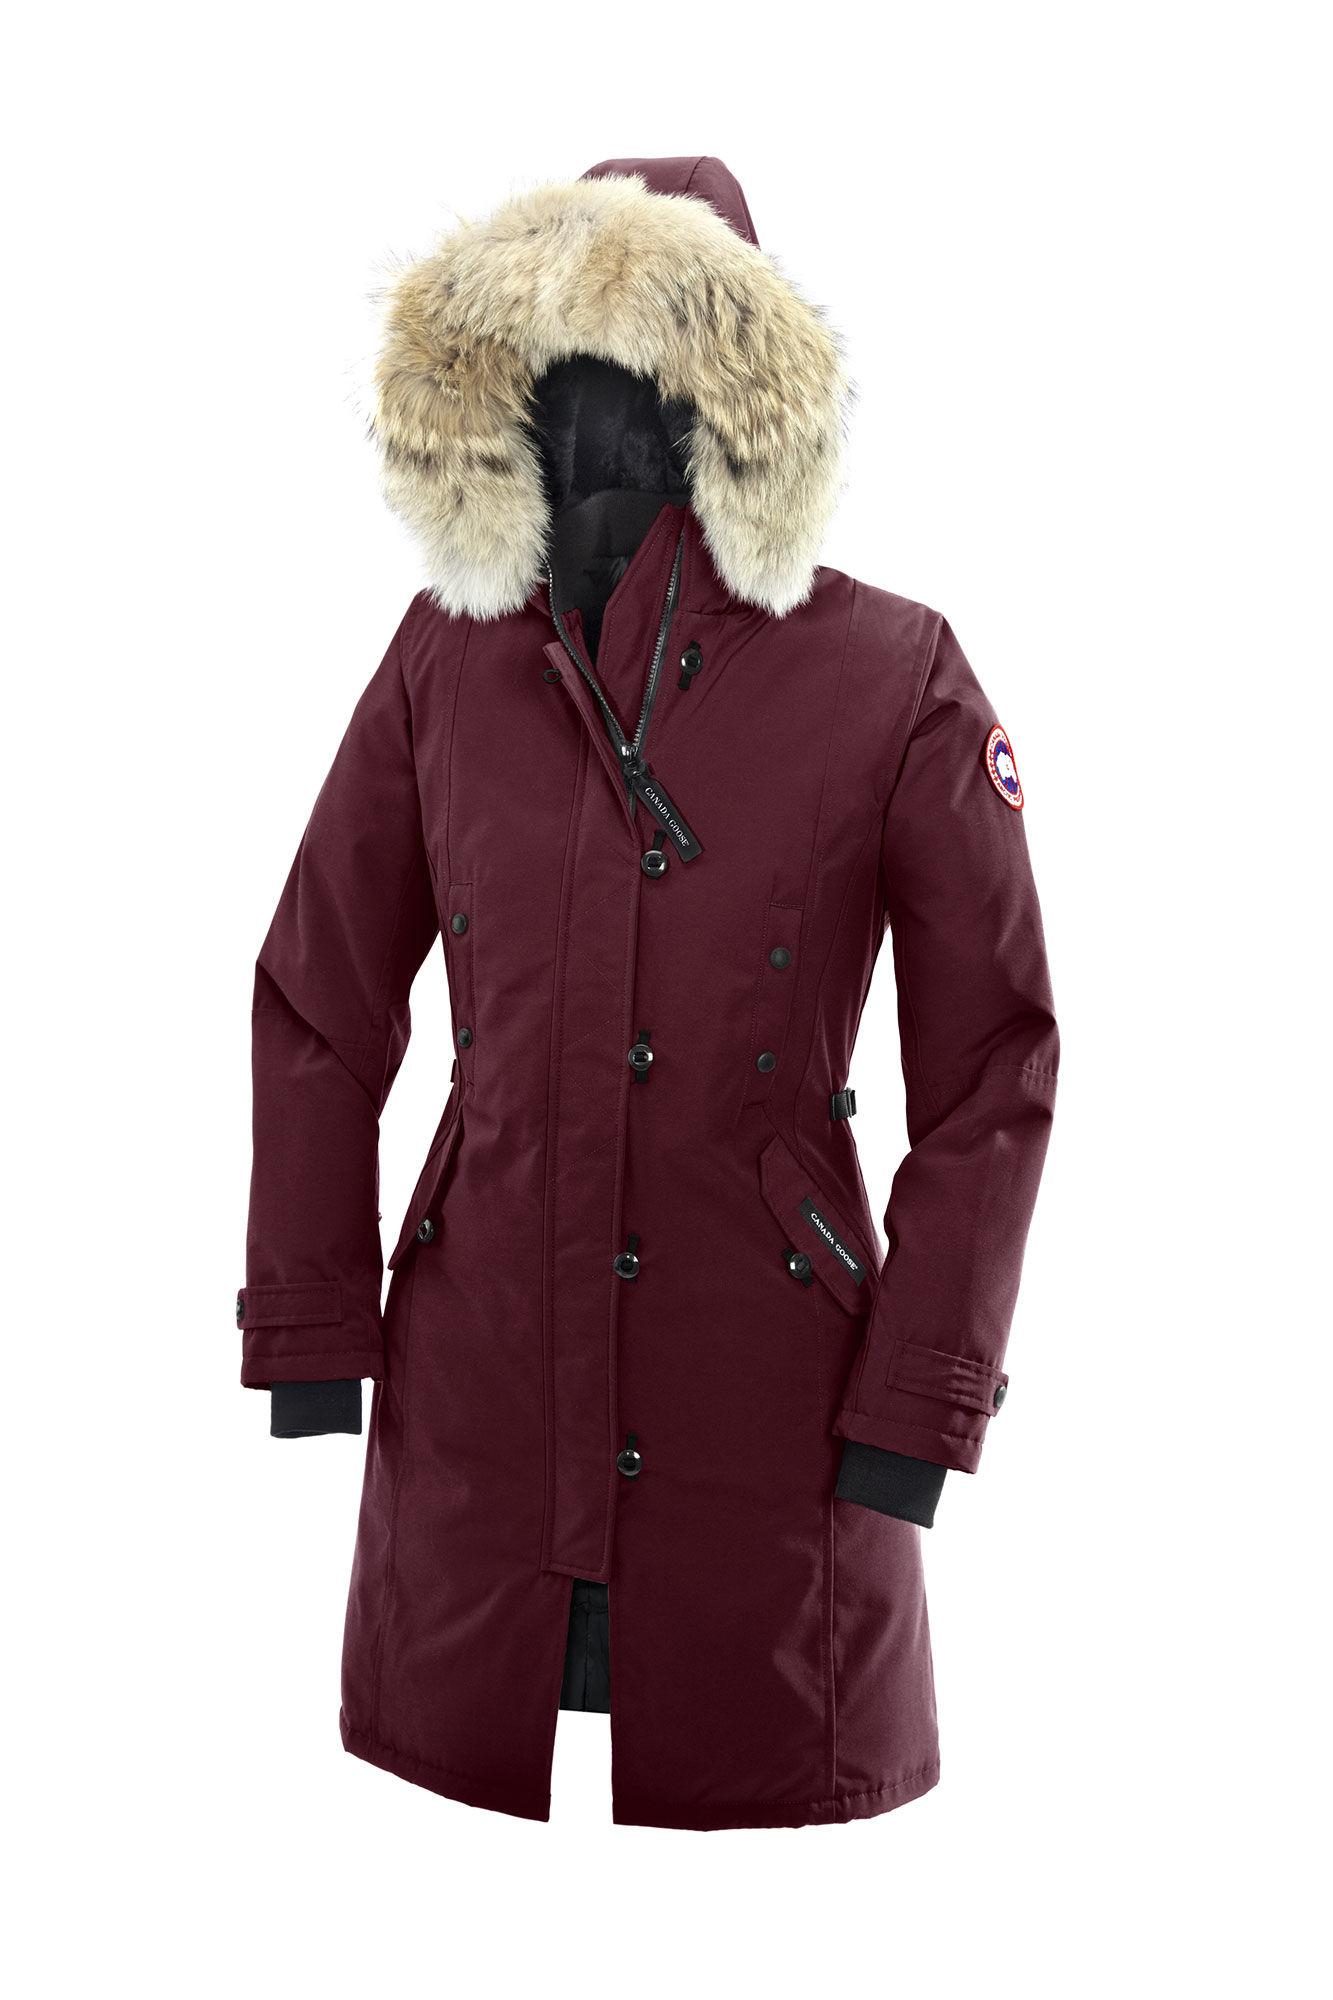 Canada Goose parka replica 2016 - Canada Goose Kensington | Shop Canada Goose Kensington Parka on ...